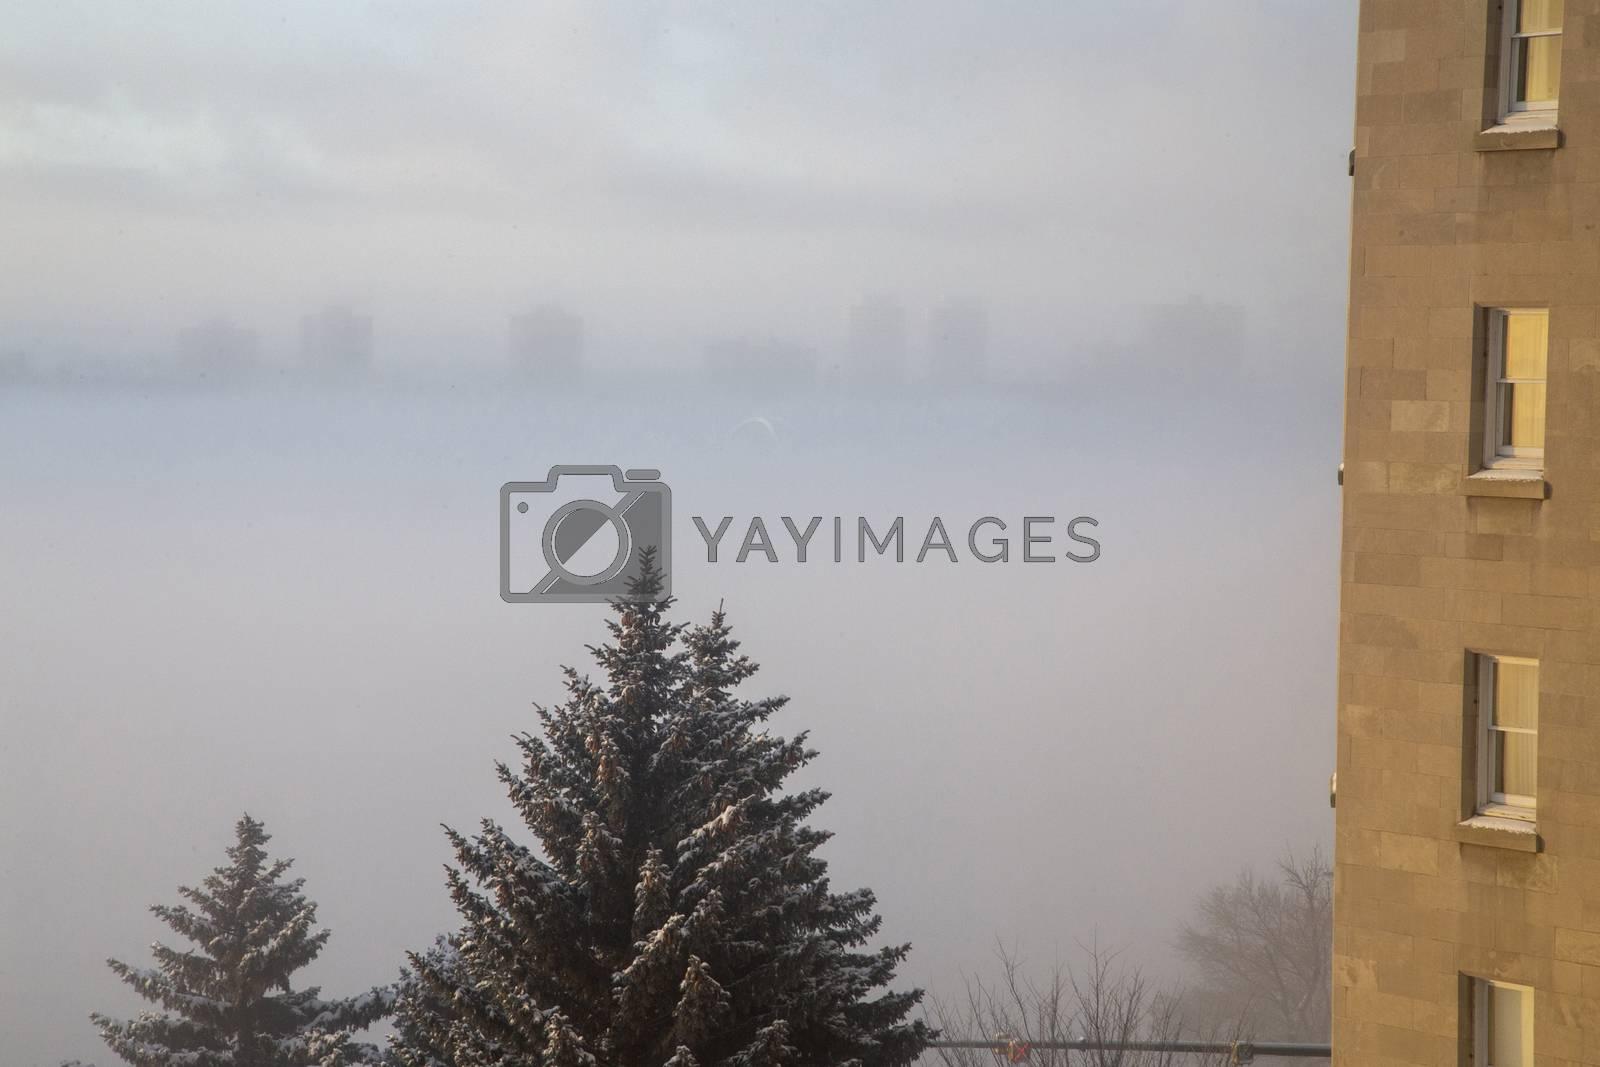 Hotel Macdonald Edmonton Sunrise over the foggy valley